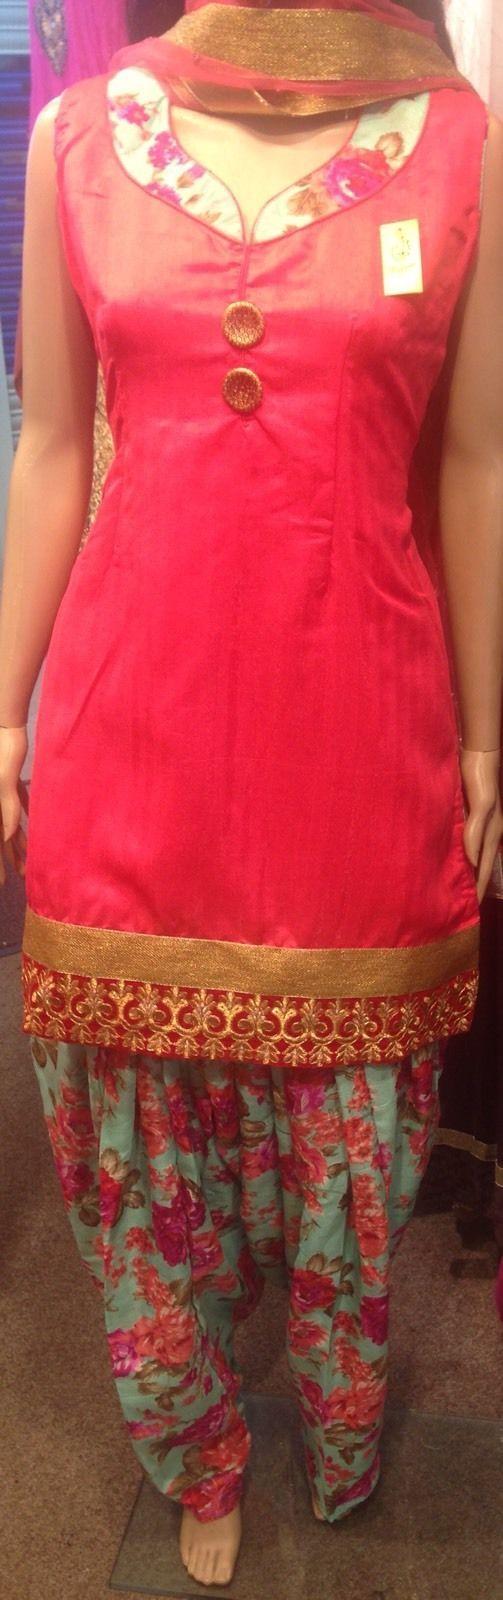 Patiala shalwar kameez Suit Floral new style one size plus stitched | eBay